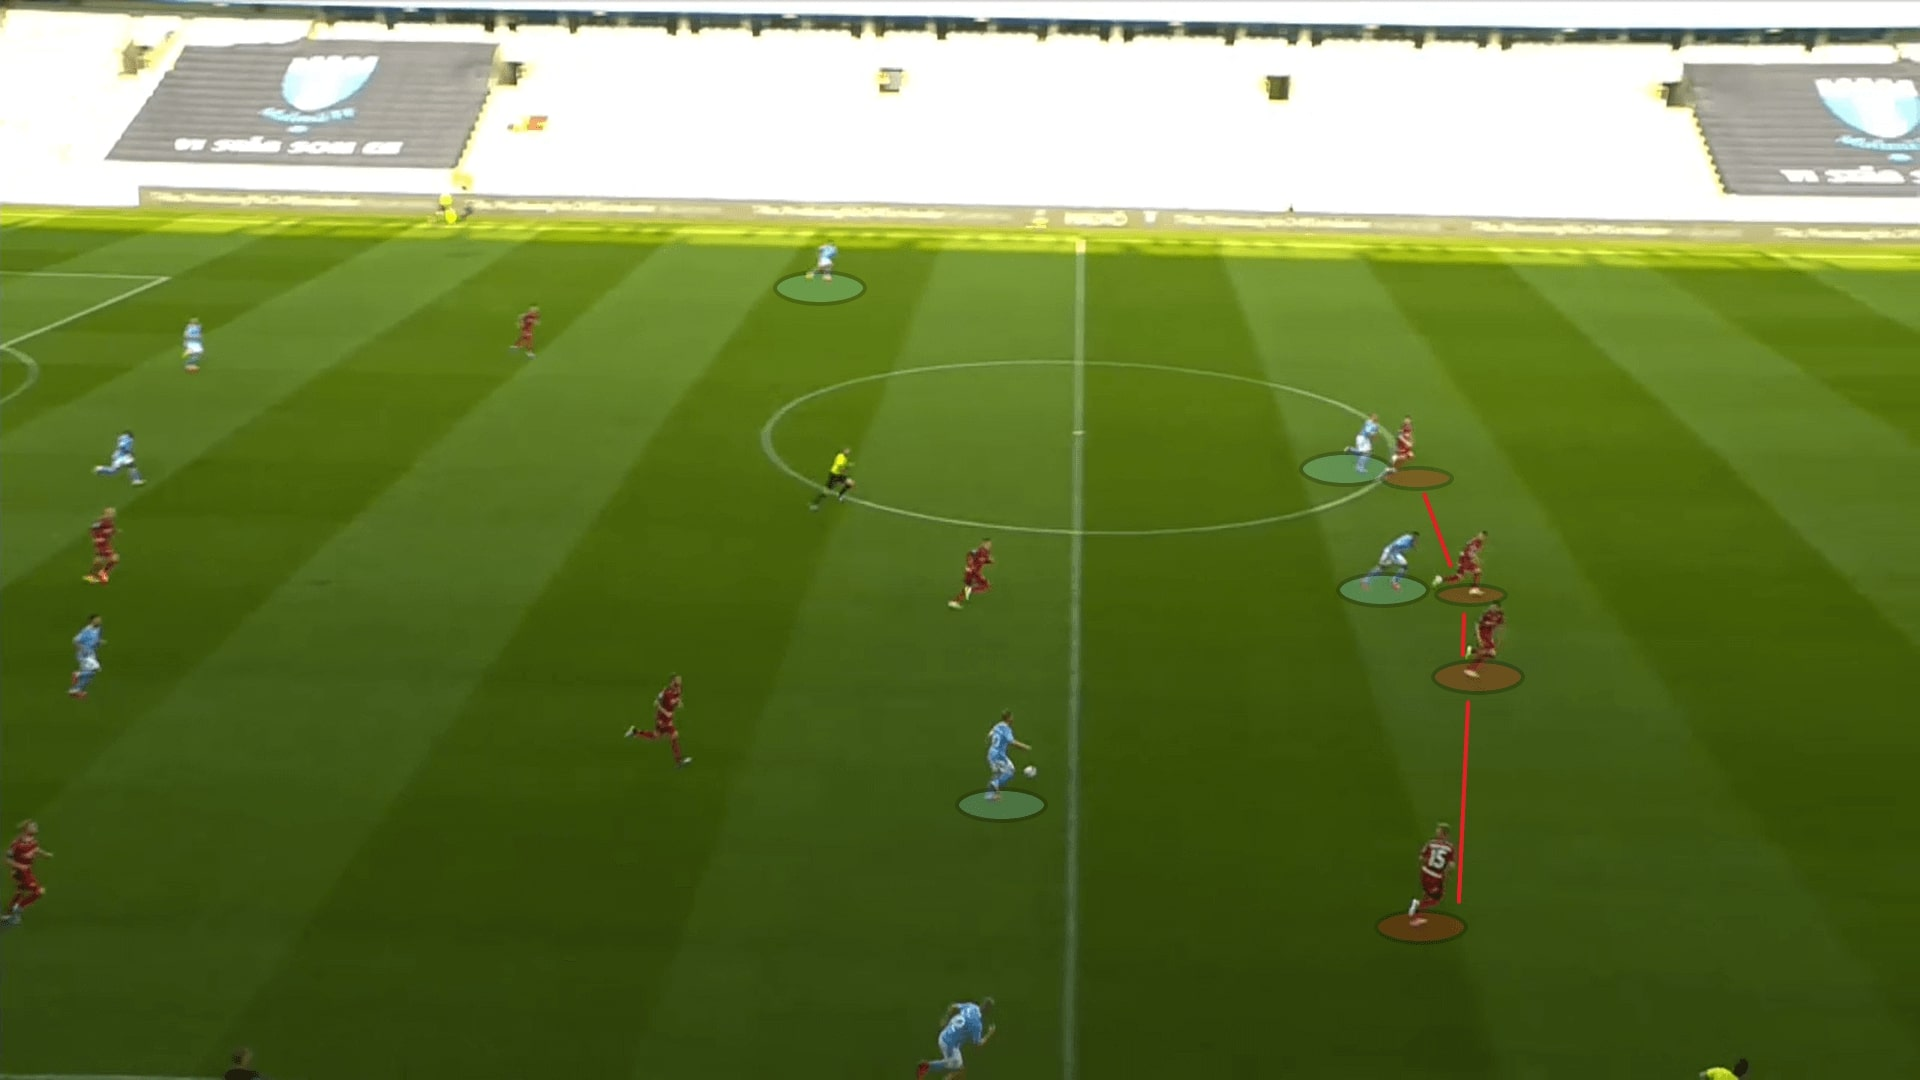 Allsvenskan 2020: Malmo FF vs Djurgardens - tactical analysis tactics